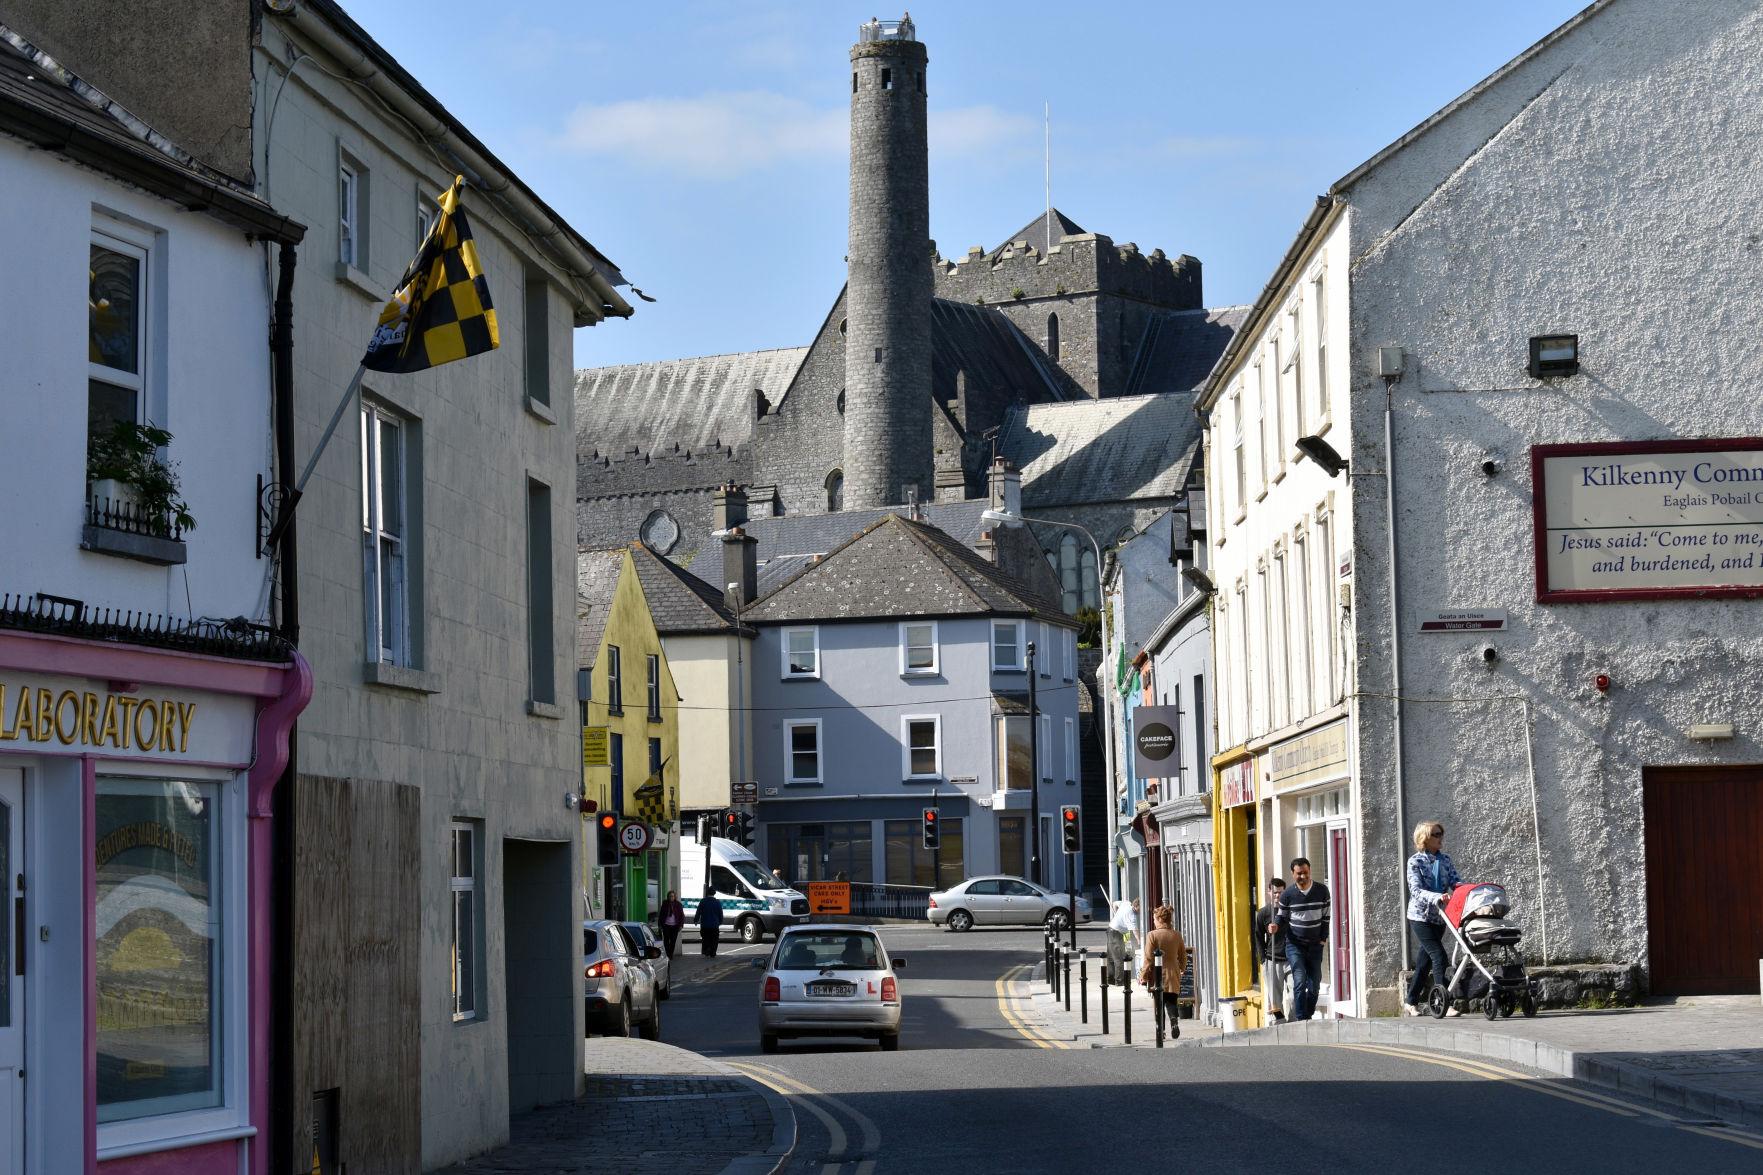 Modern In Charming Medieval KilkennyIreland Meets 1TlFJuKc3